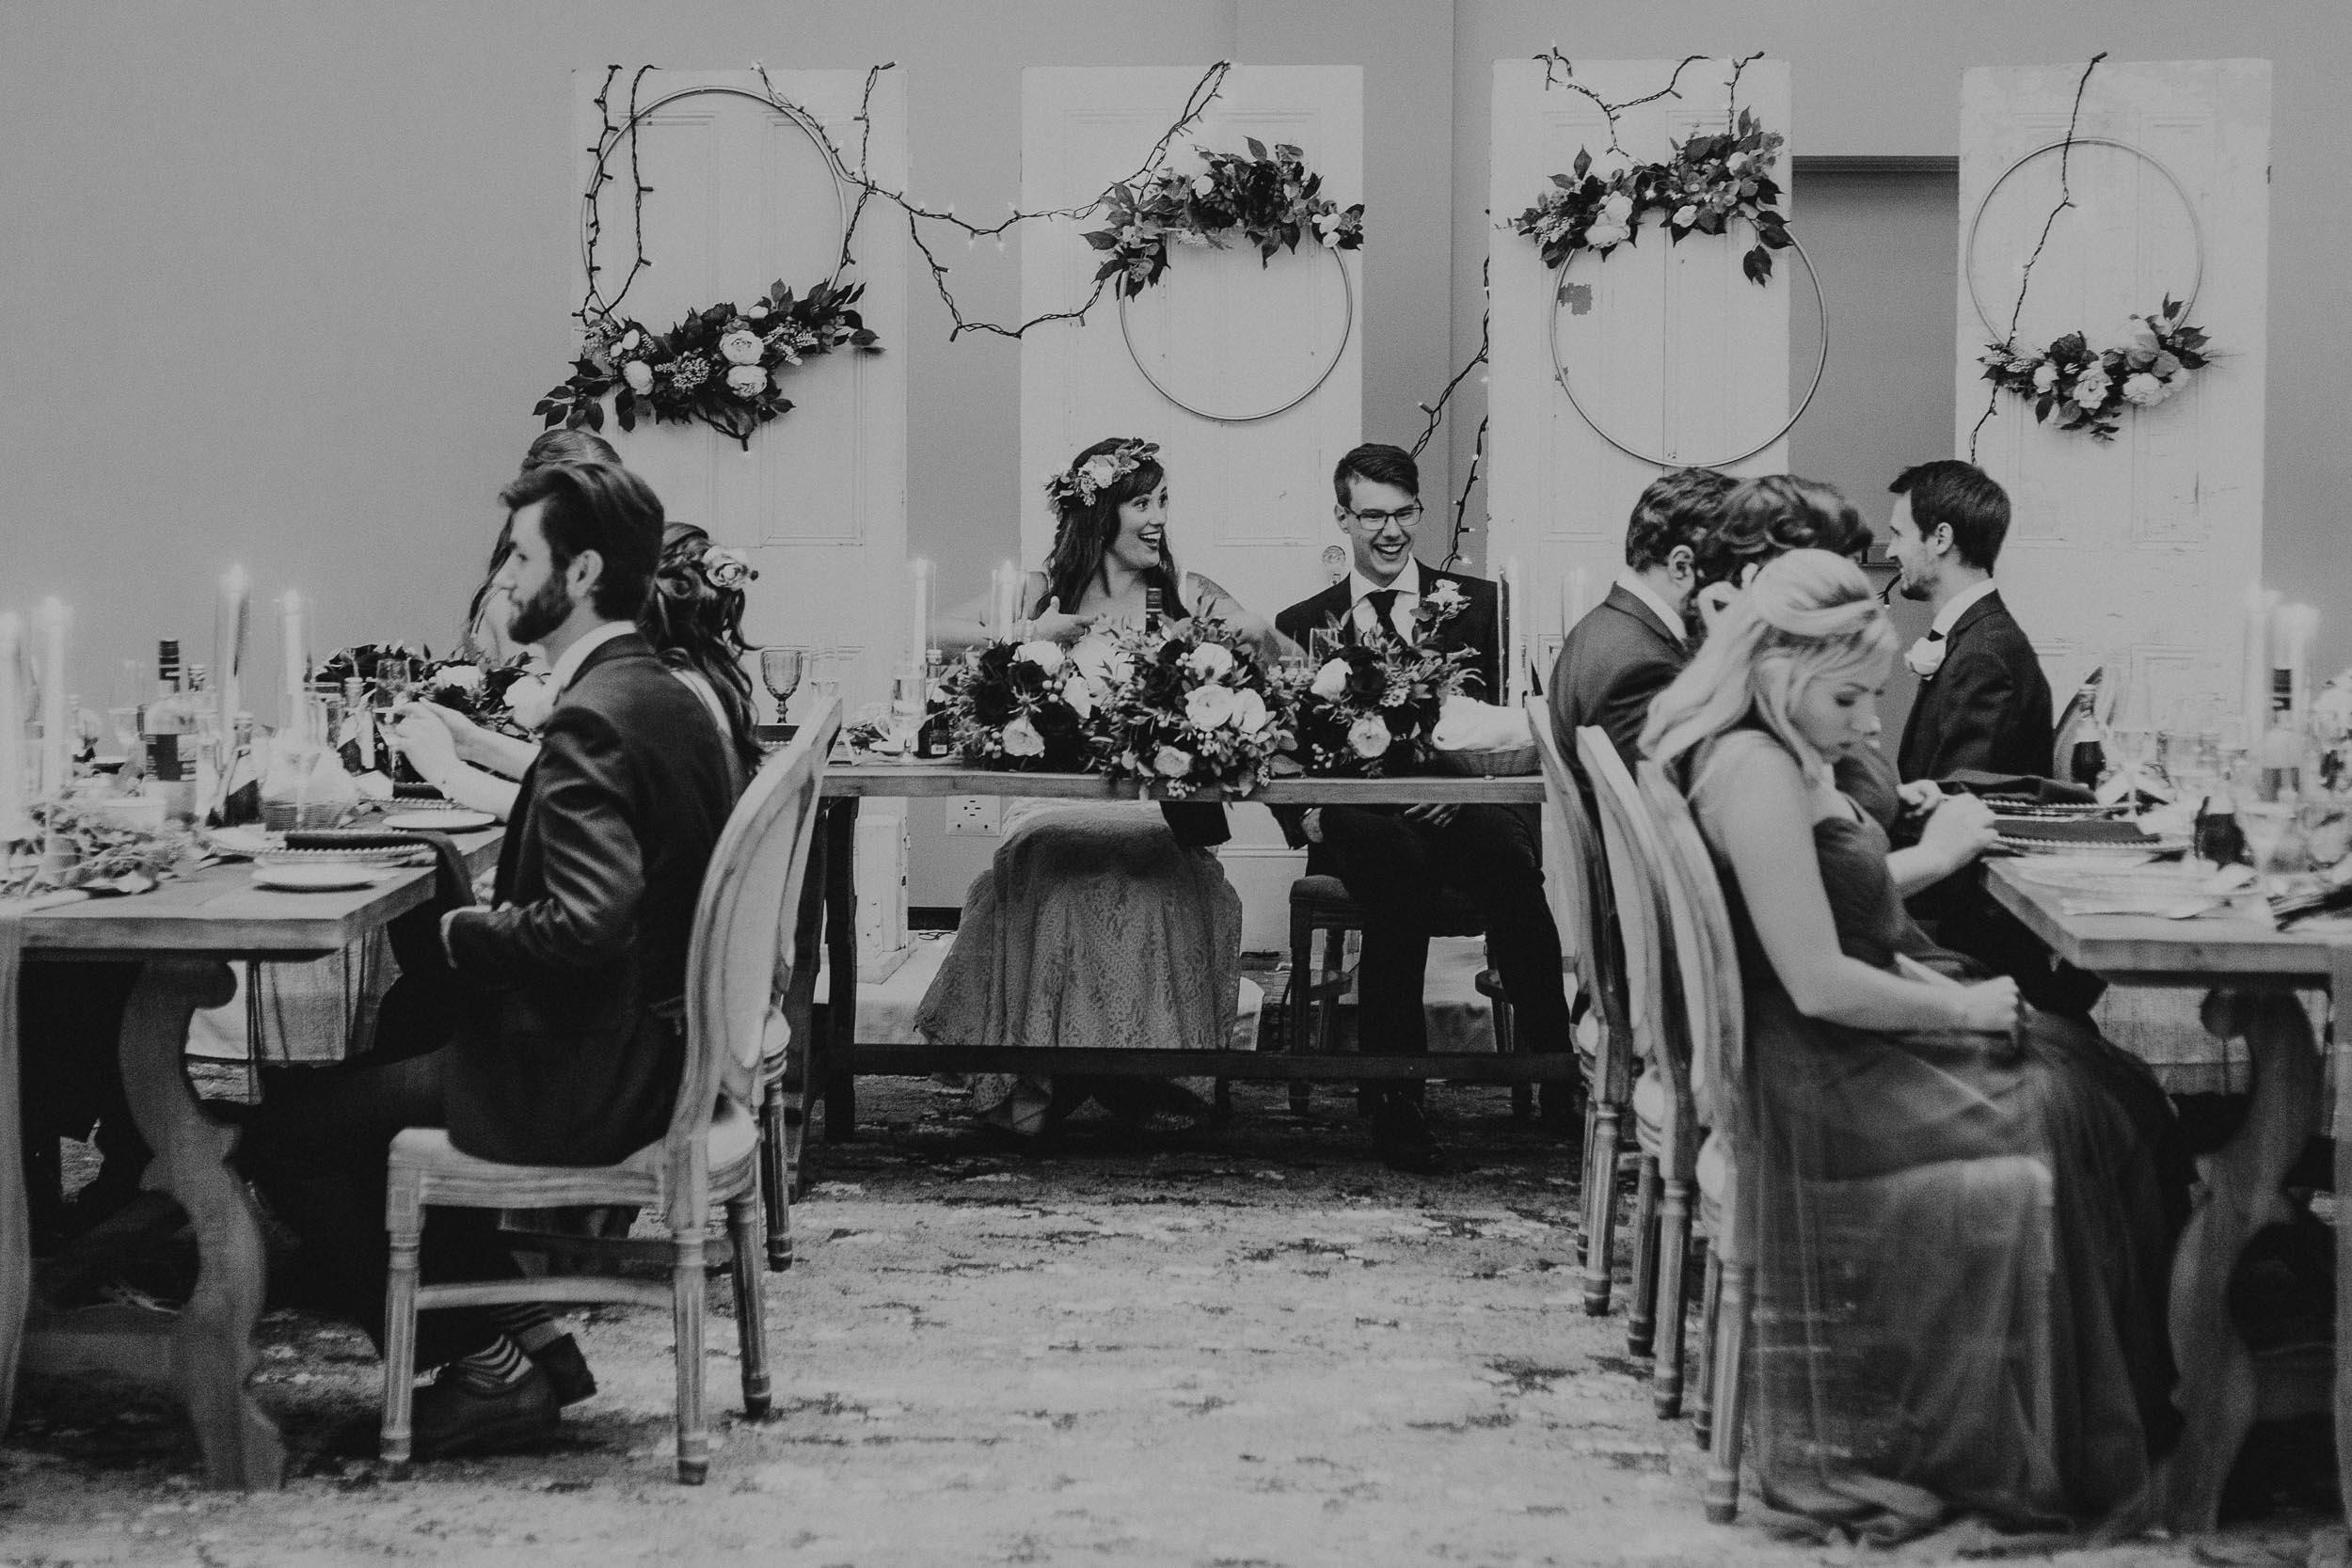 intimate-wedding-elopement-photographer-ottawa-toronto-8261.jpg